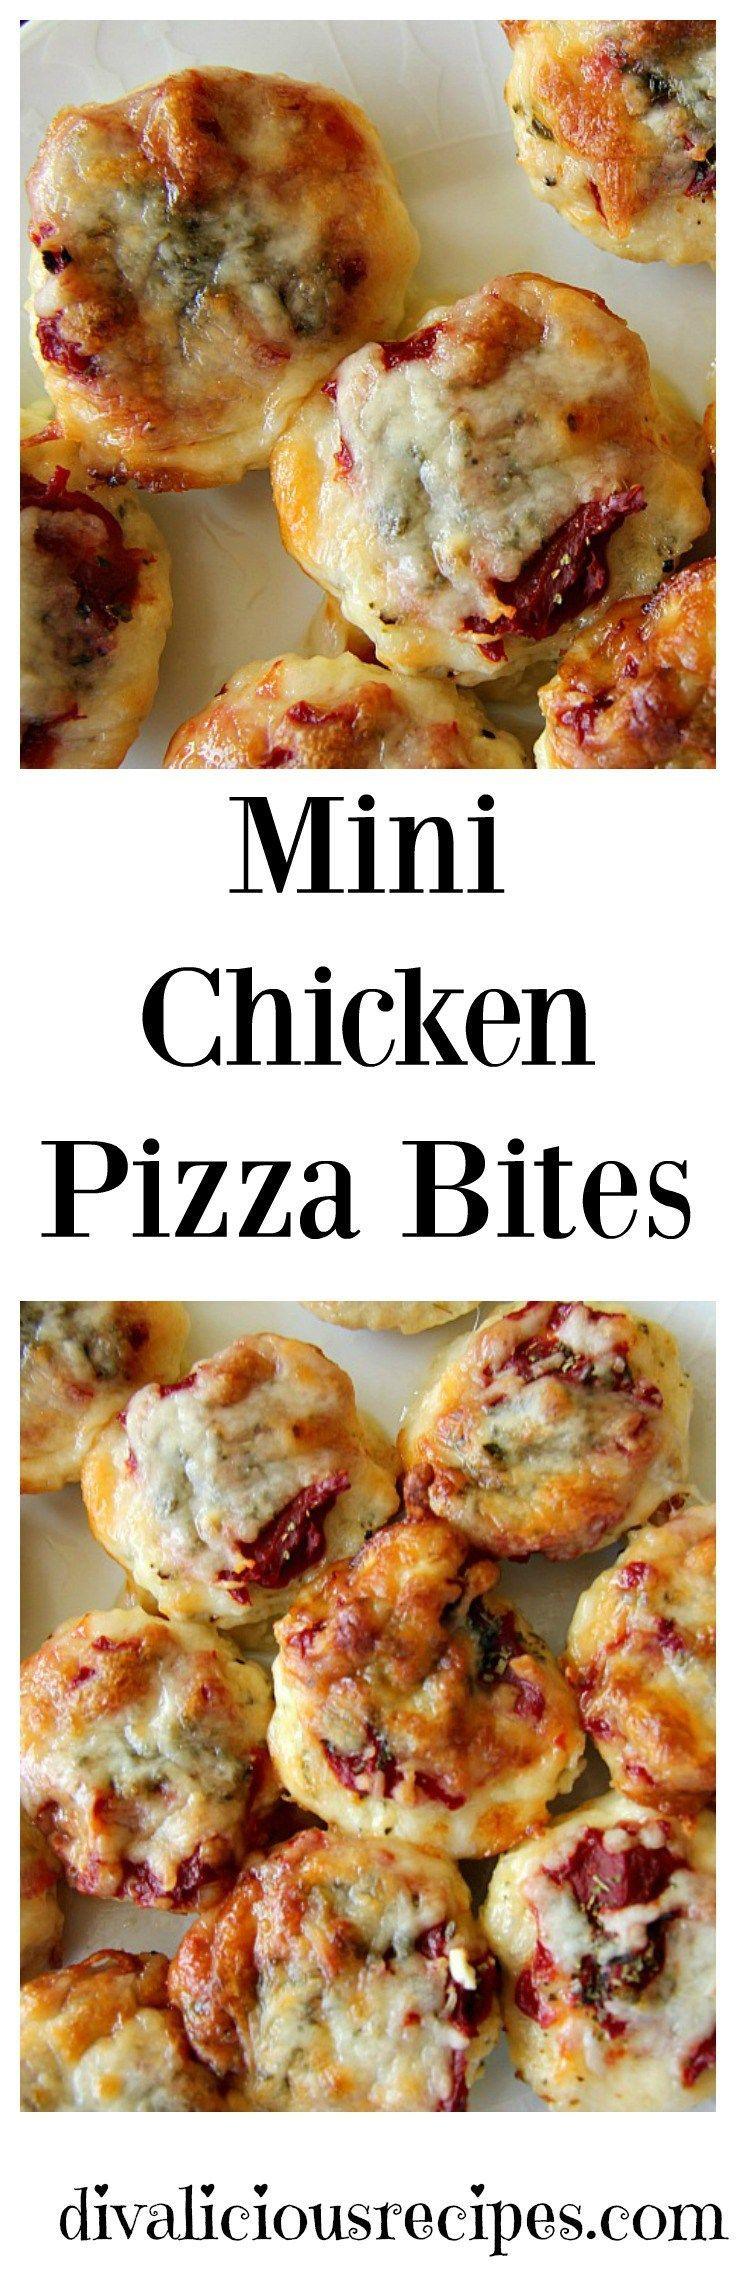 17 best ideas about pizza bites on pinterest pepperoni. Black Bedroom Furniture Sets. Home Design Ideas